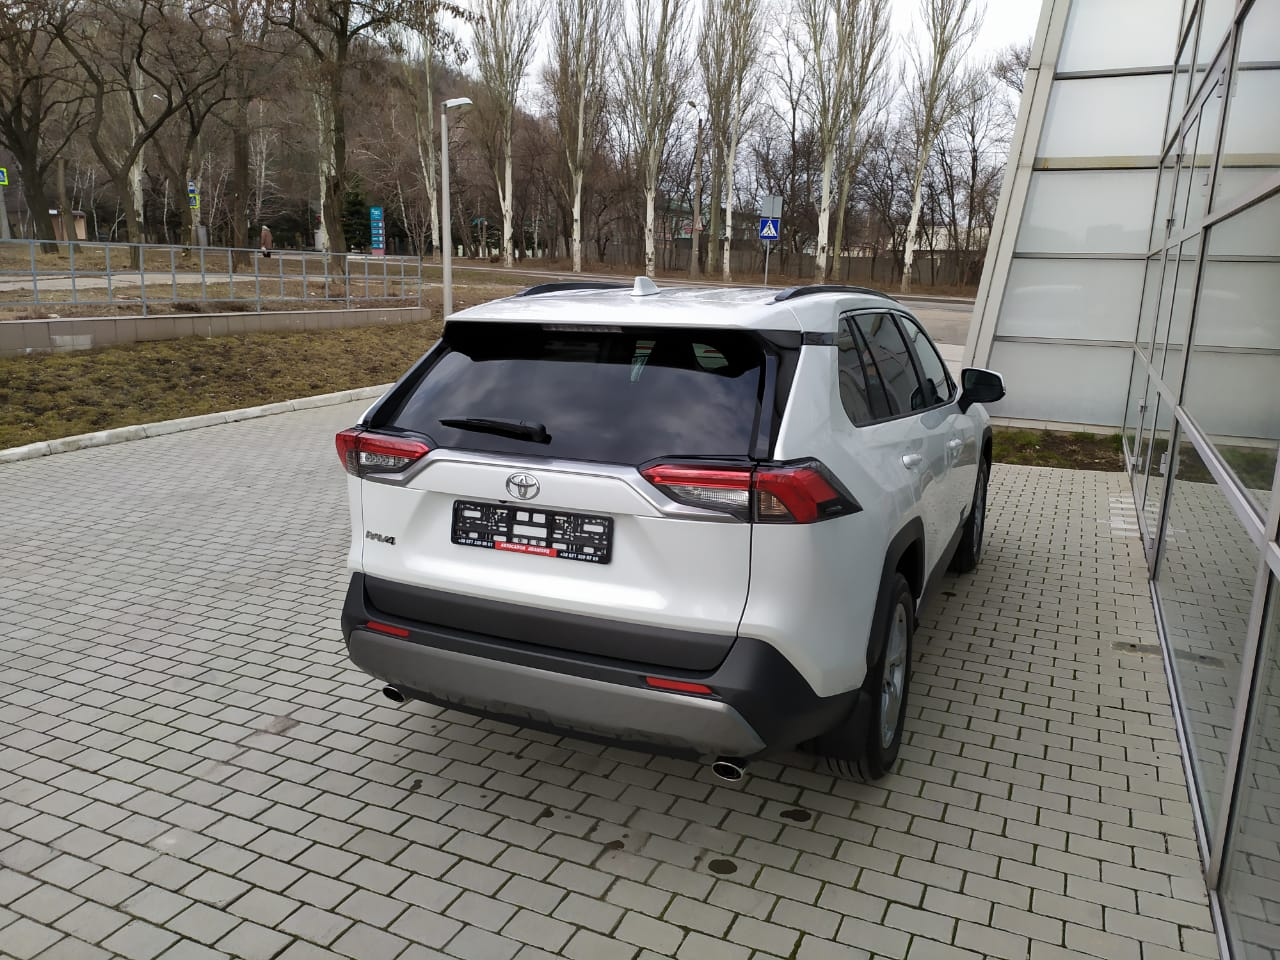 Toyota RAV4, 2.0  (149 л.с.), CVT, 2 WD, 2021